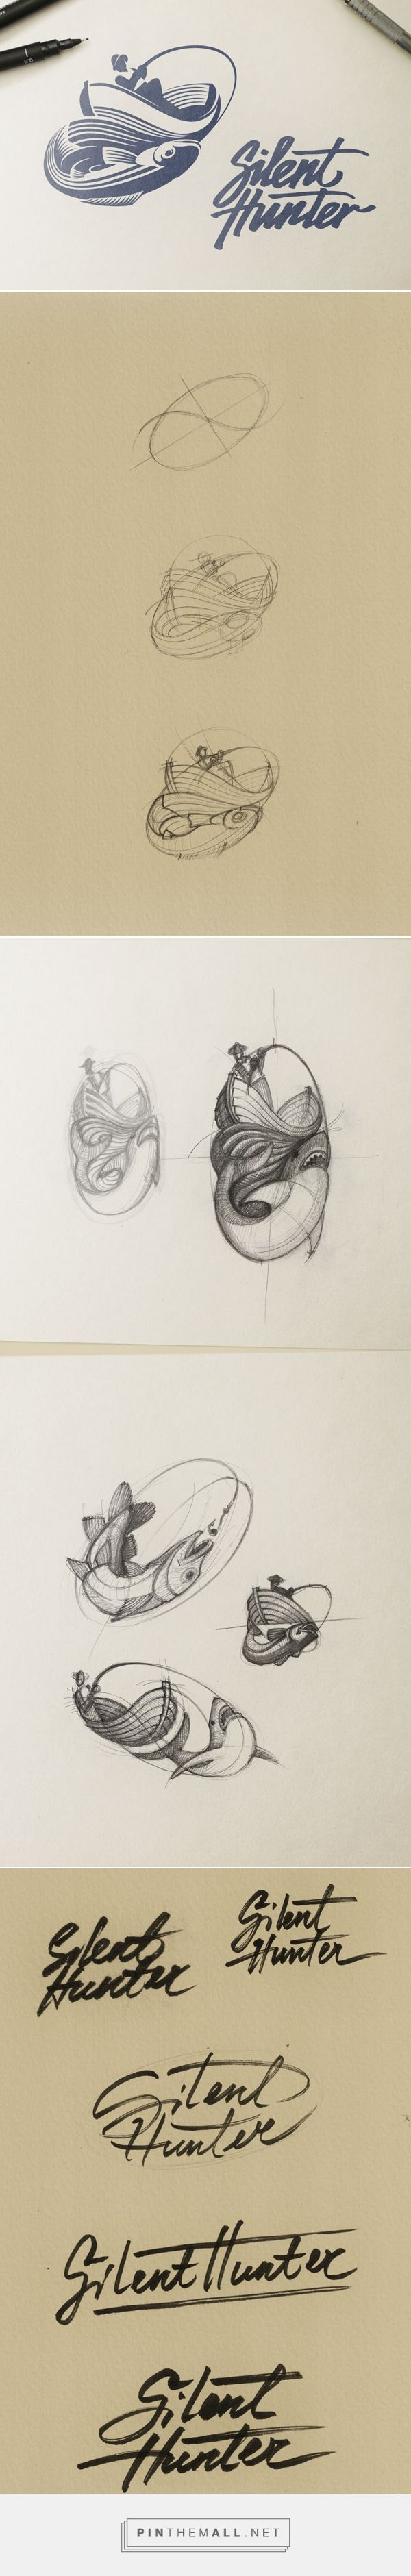 Logo creation process by Estudio Ramotion from an article by Manuel Ramírez for creativosonline.org #branding #design #logo